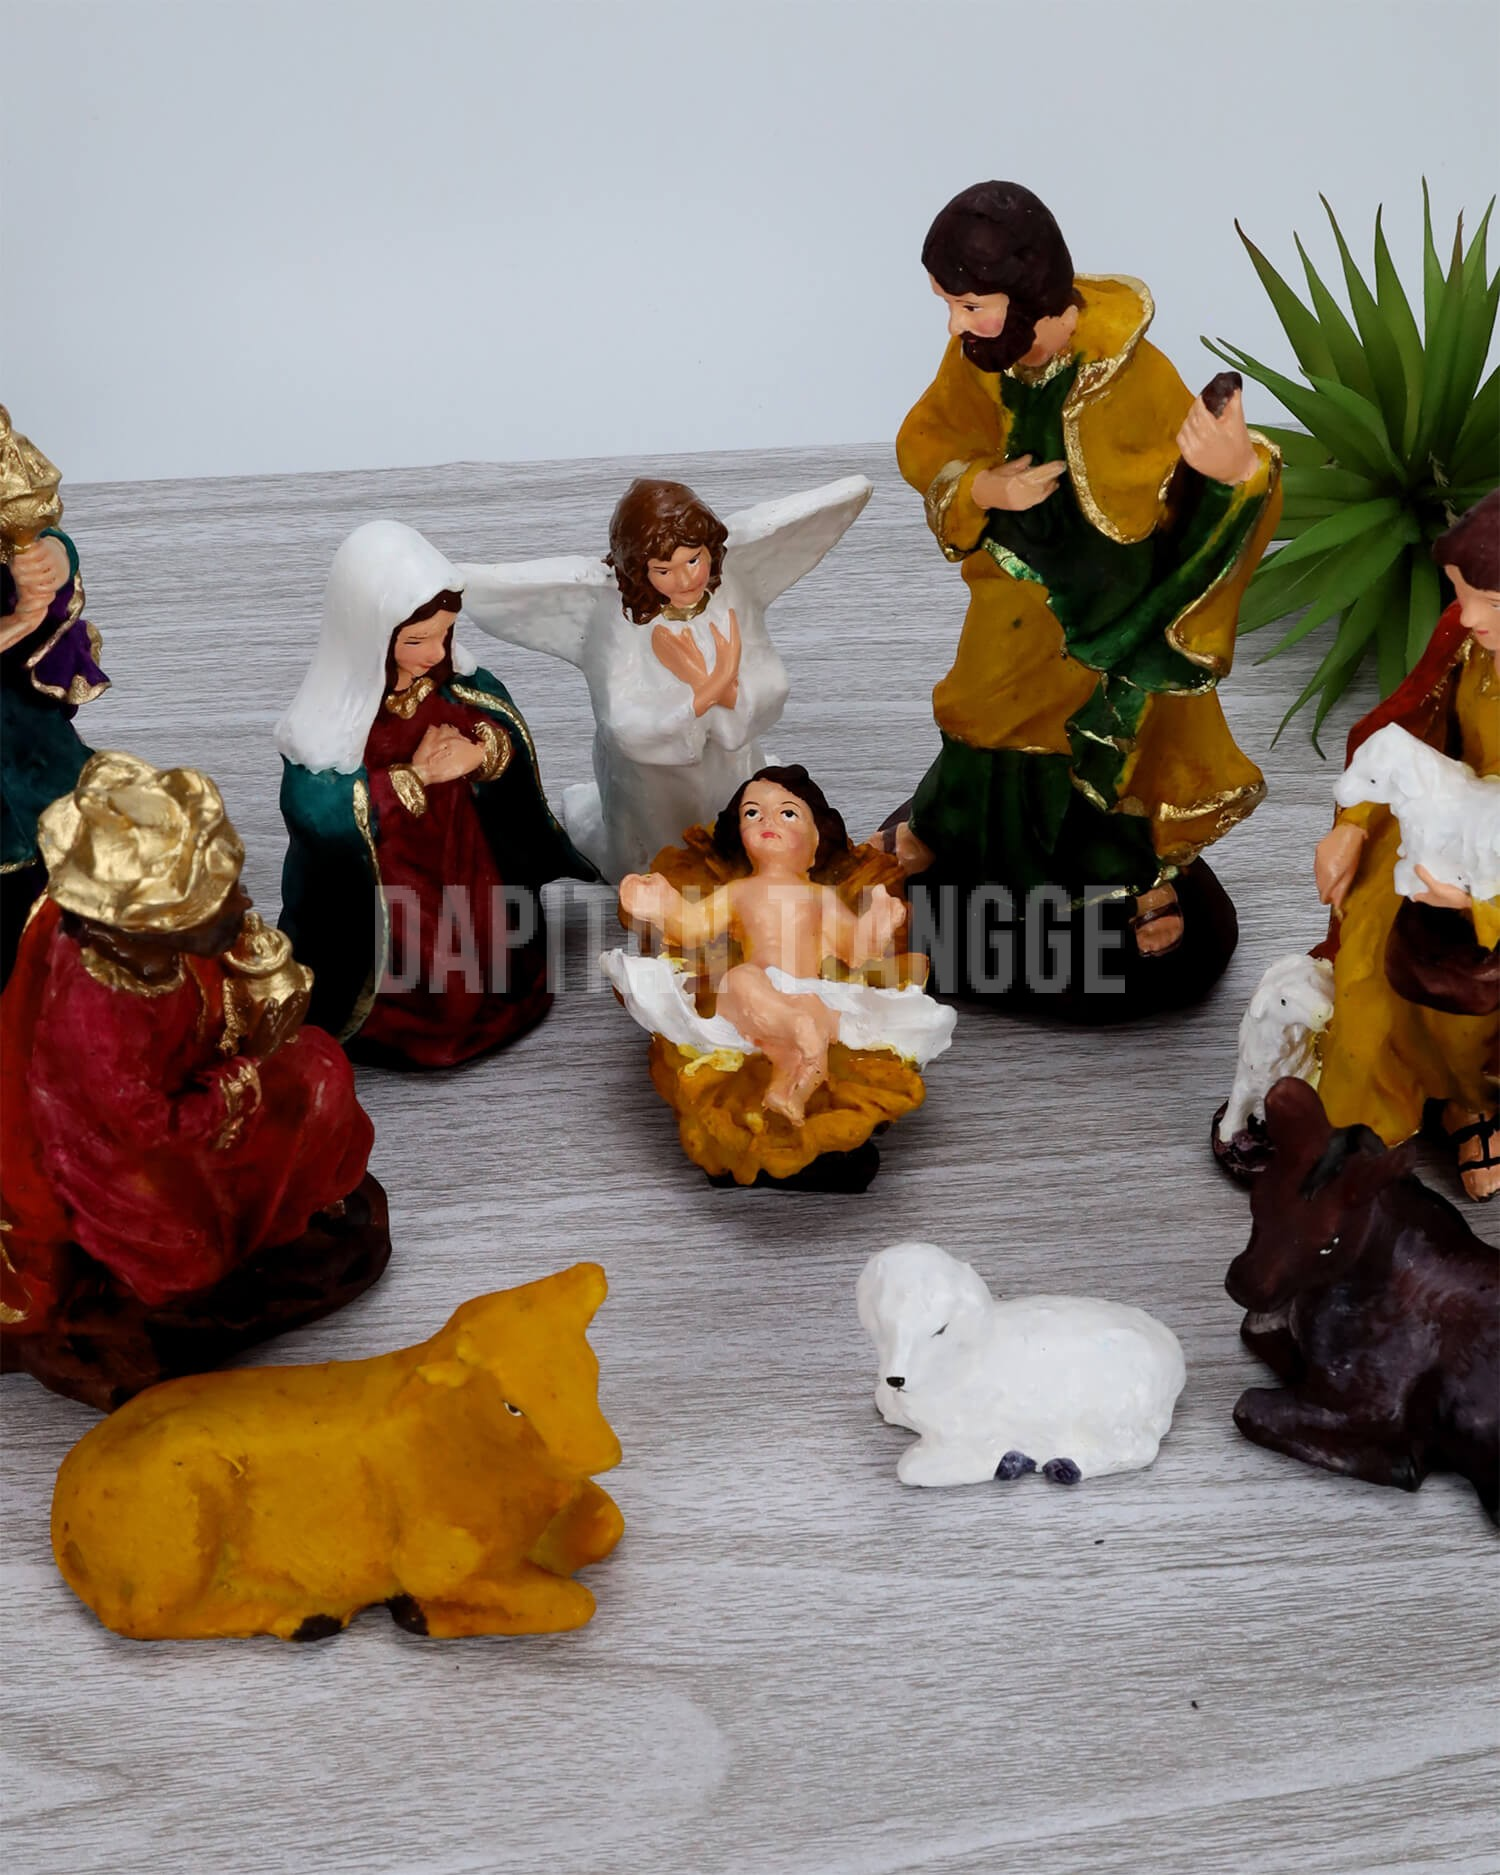 "Dapitan Tiangge 7"" Nativity Set"